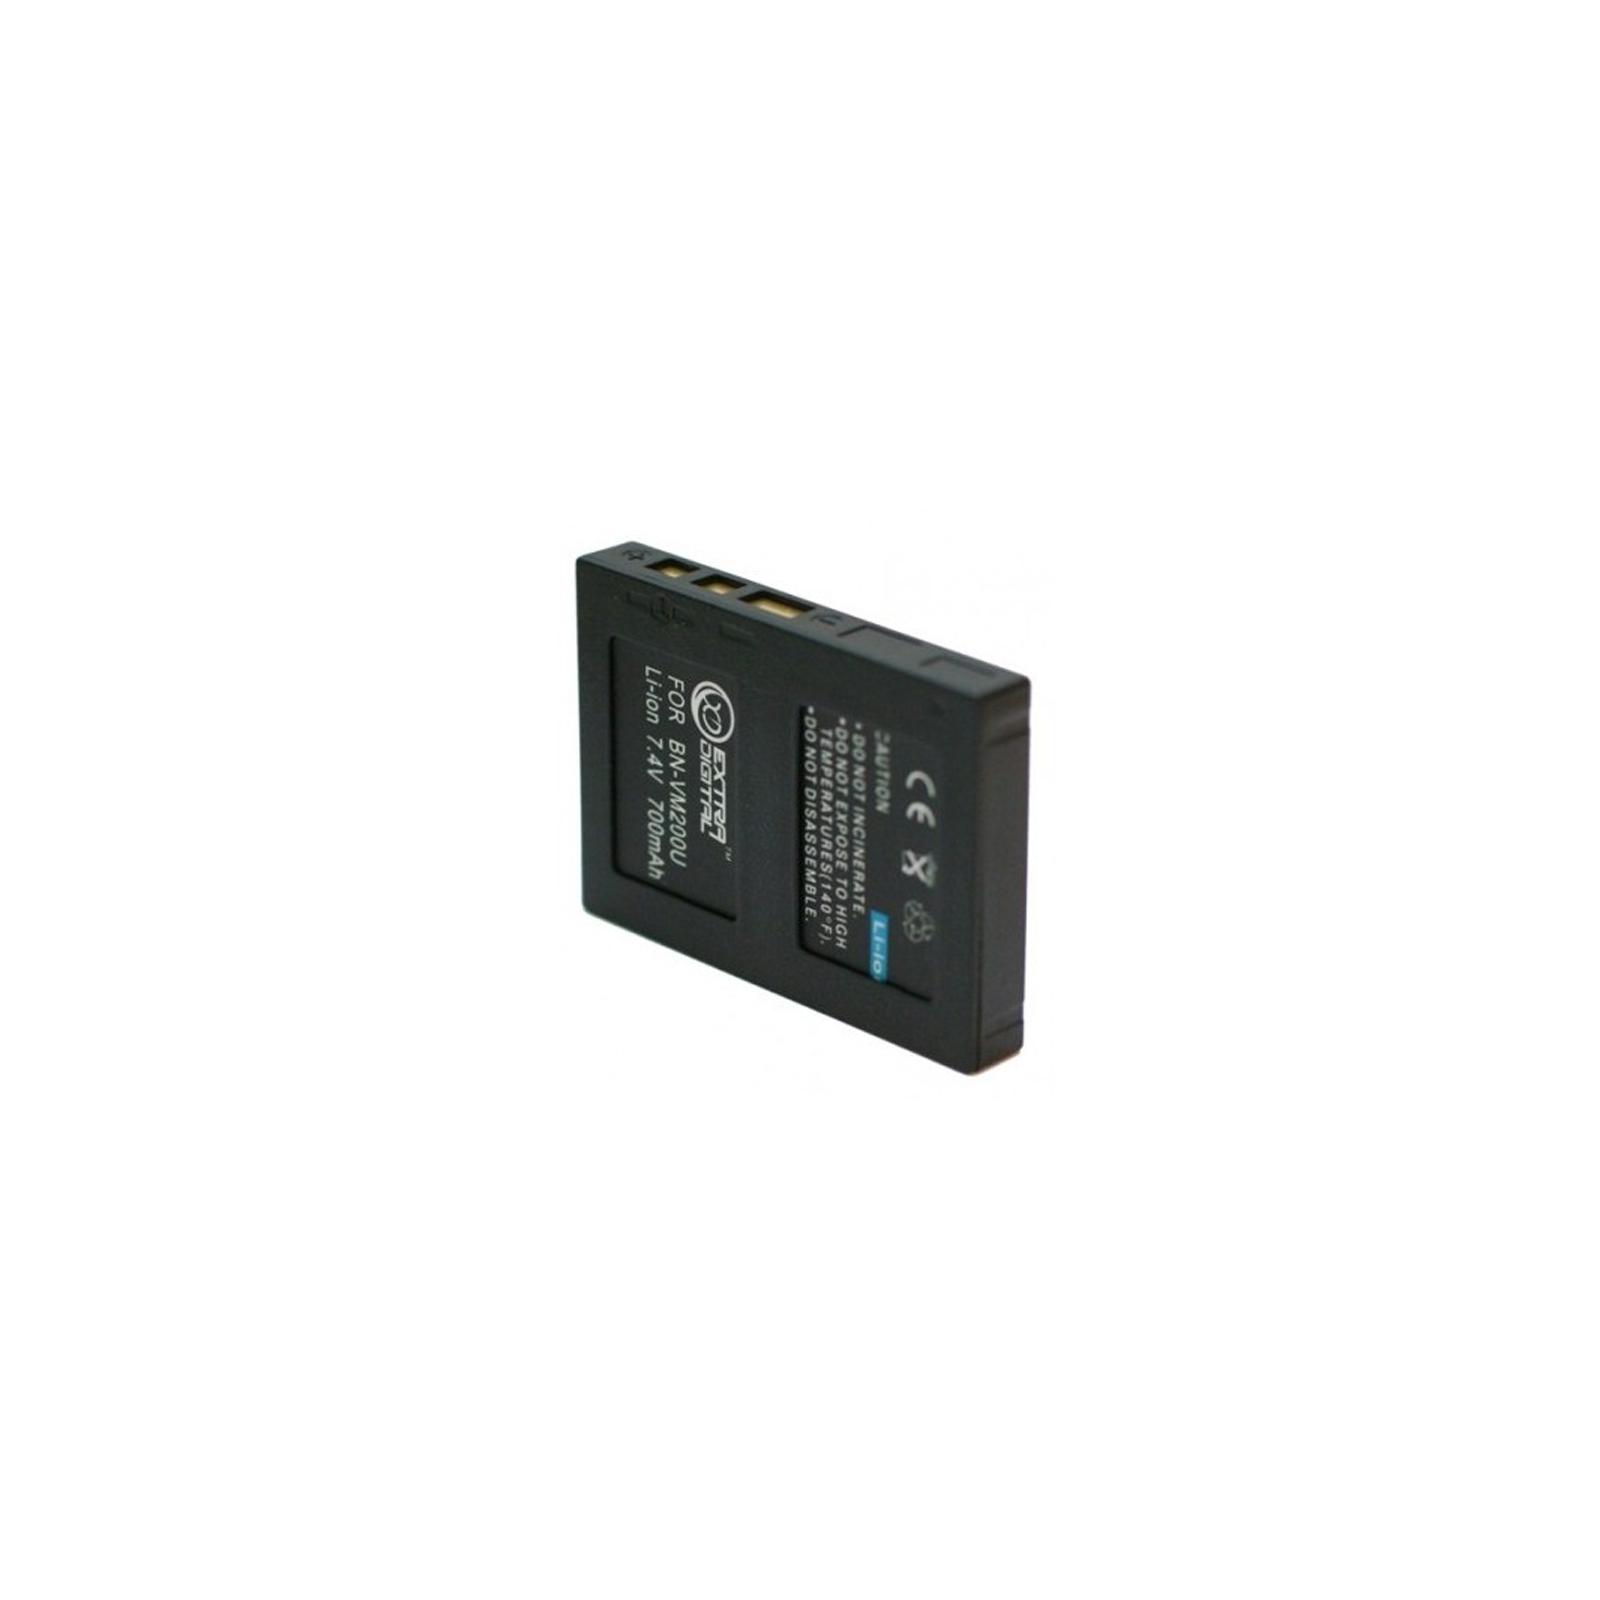 Аккумулятор к фото/видео EXTRADIGITAL JVC BN-VM200U (DV00DV1327) изображение 2